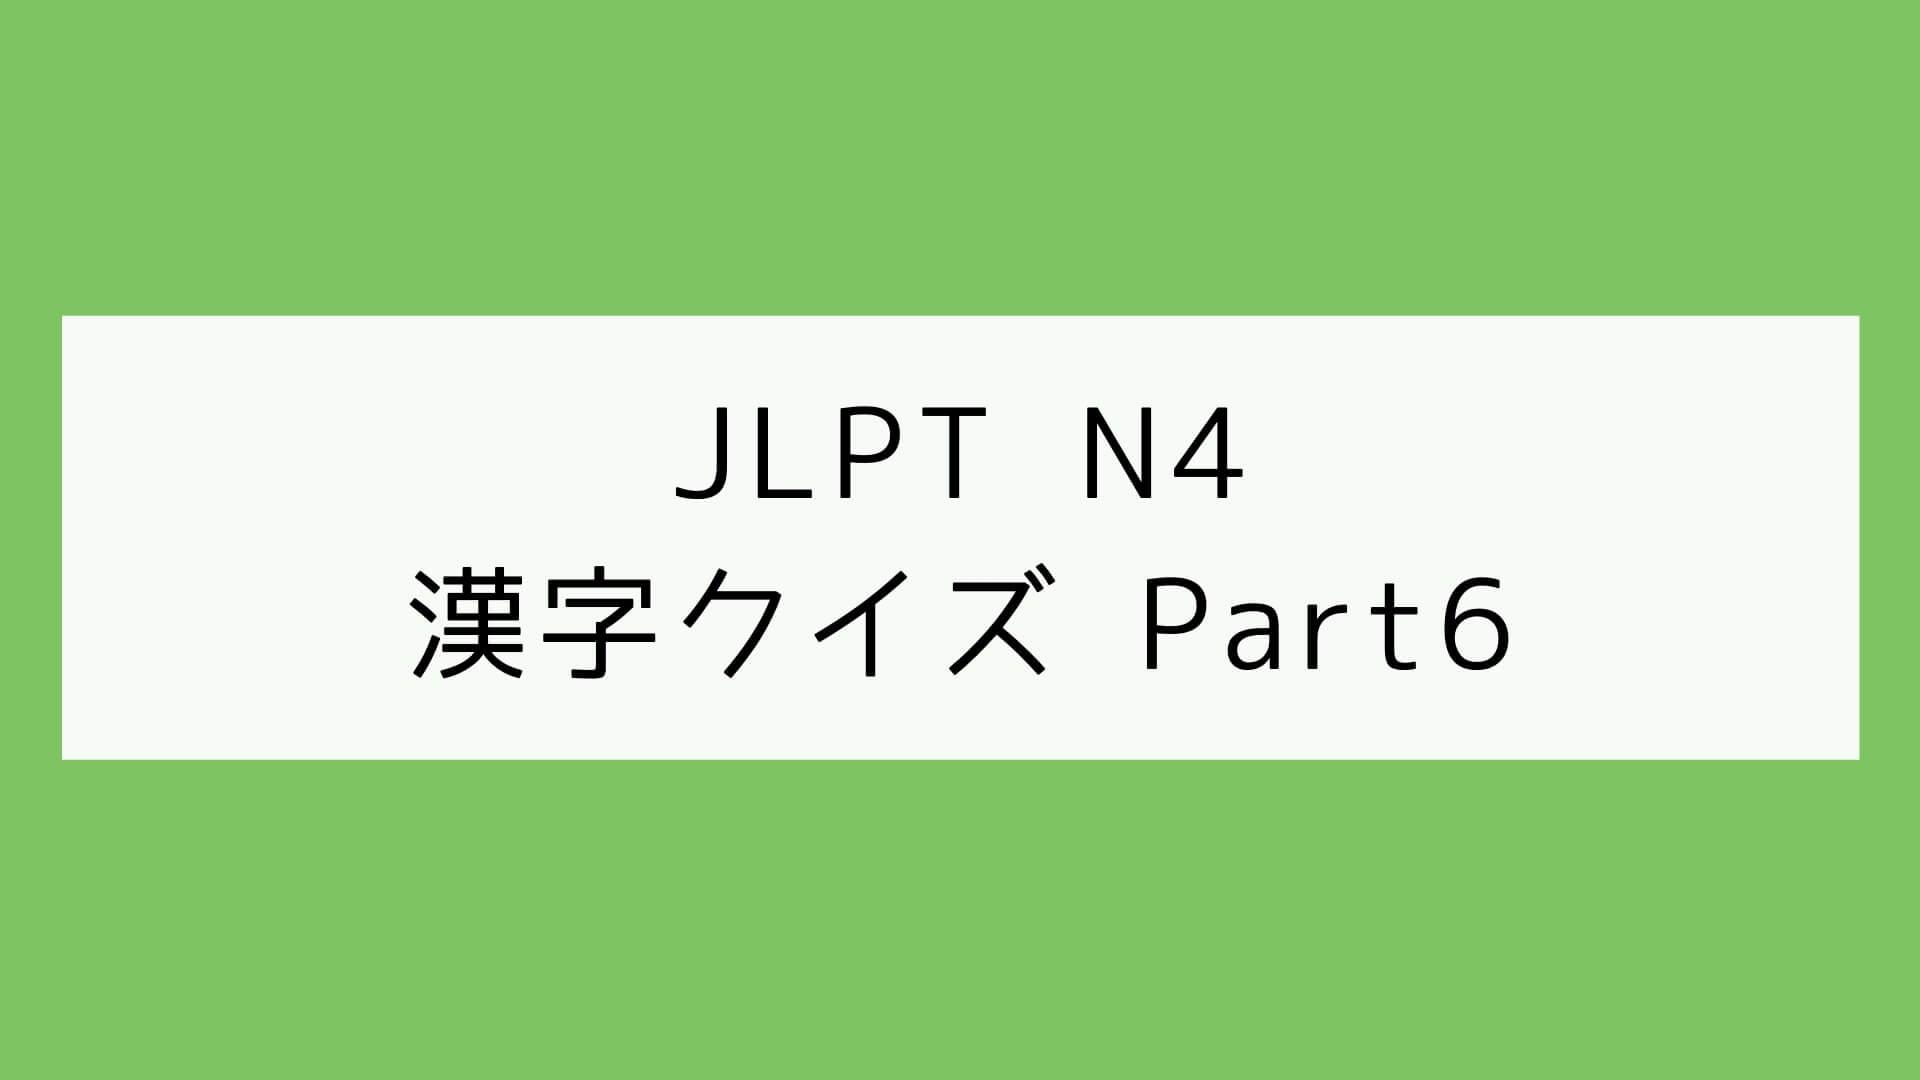 【JLPT N4】漢字クイズ Part6